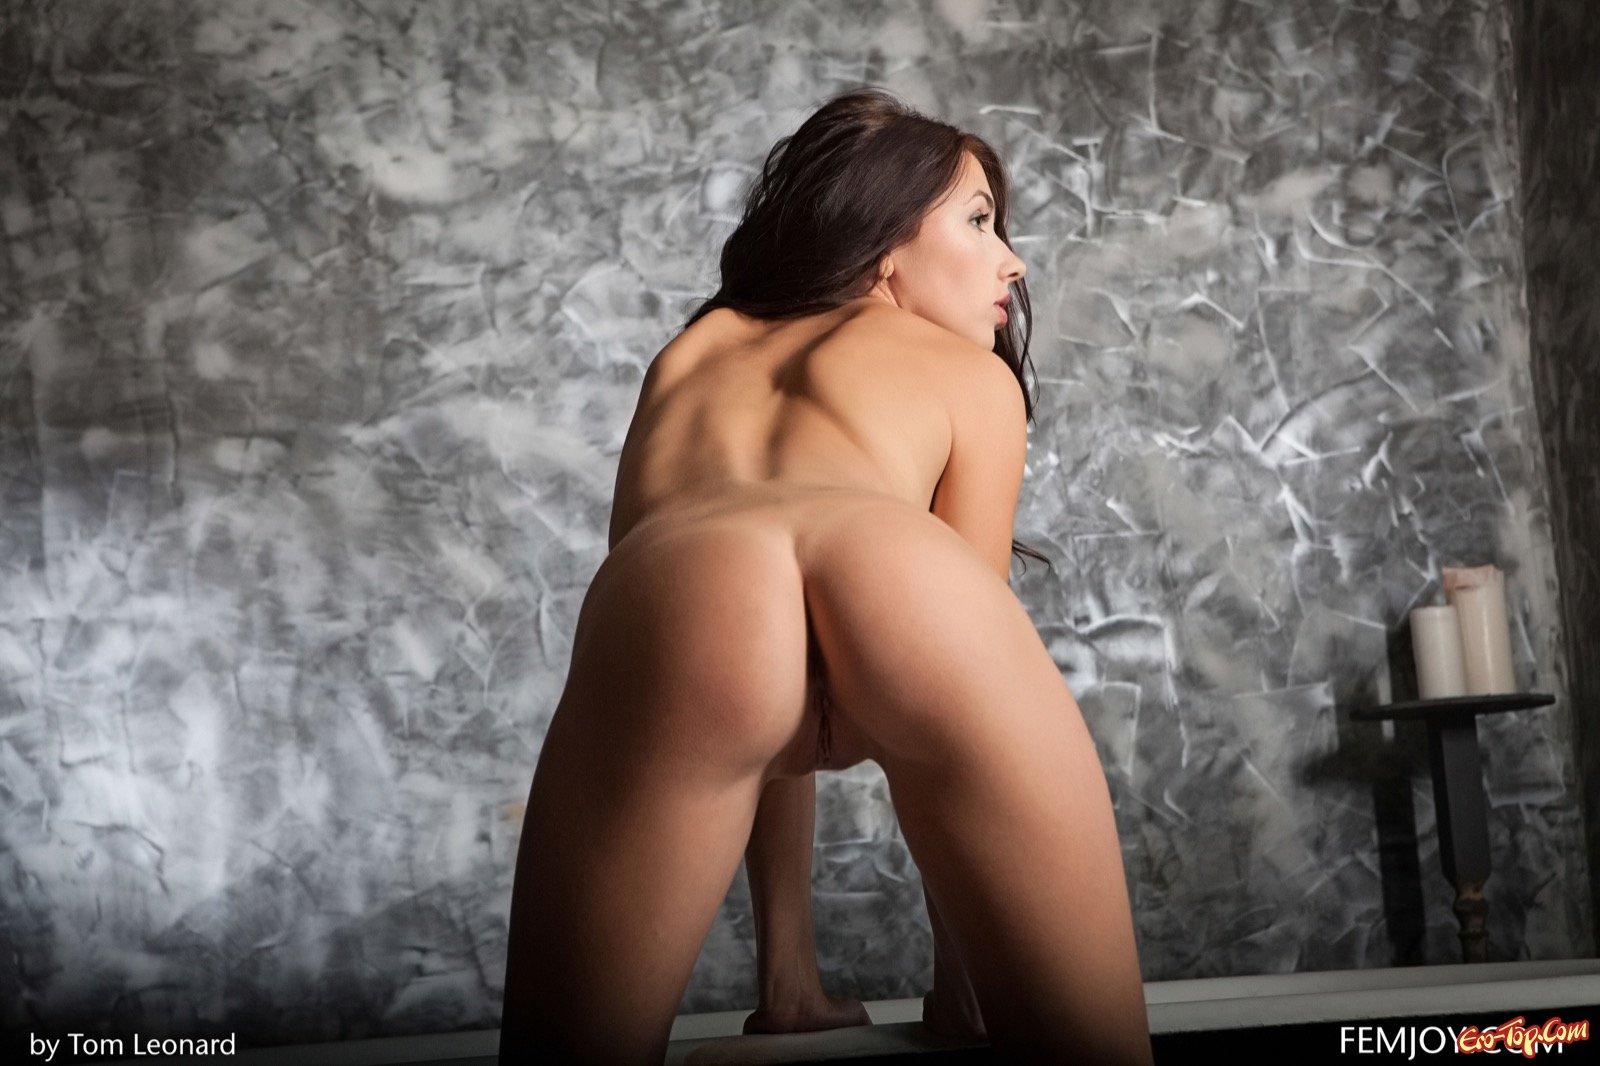 Голая леди с упругими буферами в ванной комнате секс фото